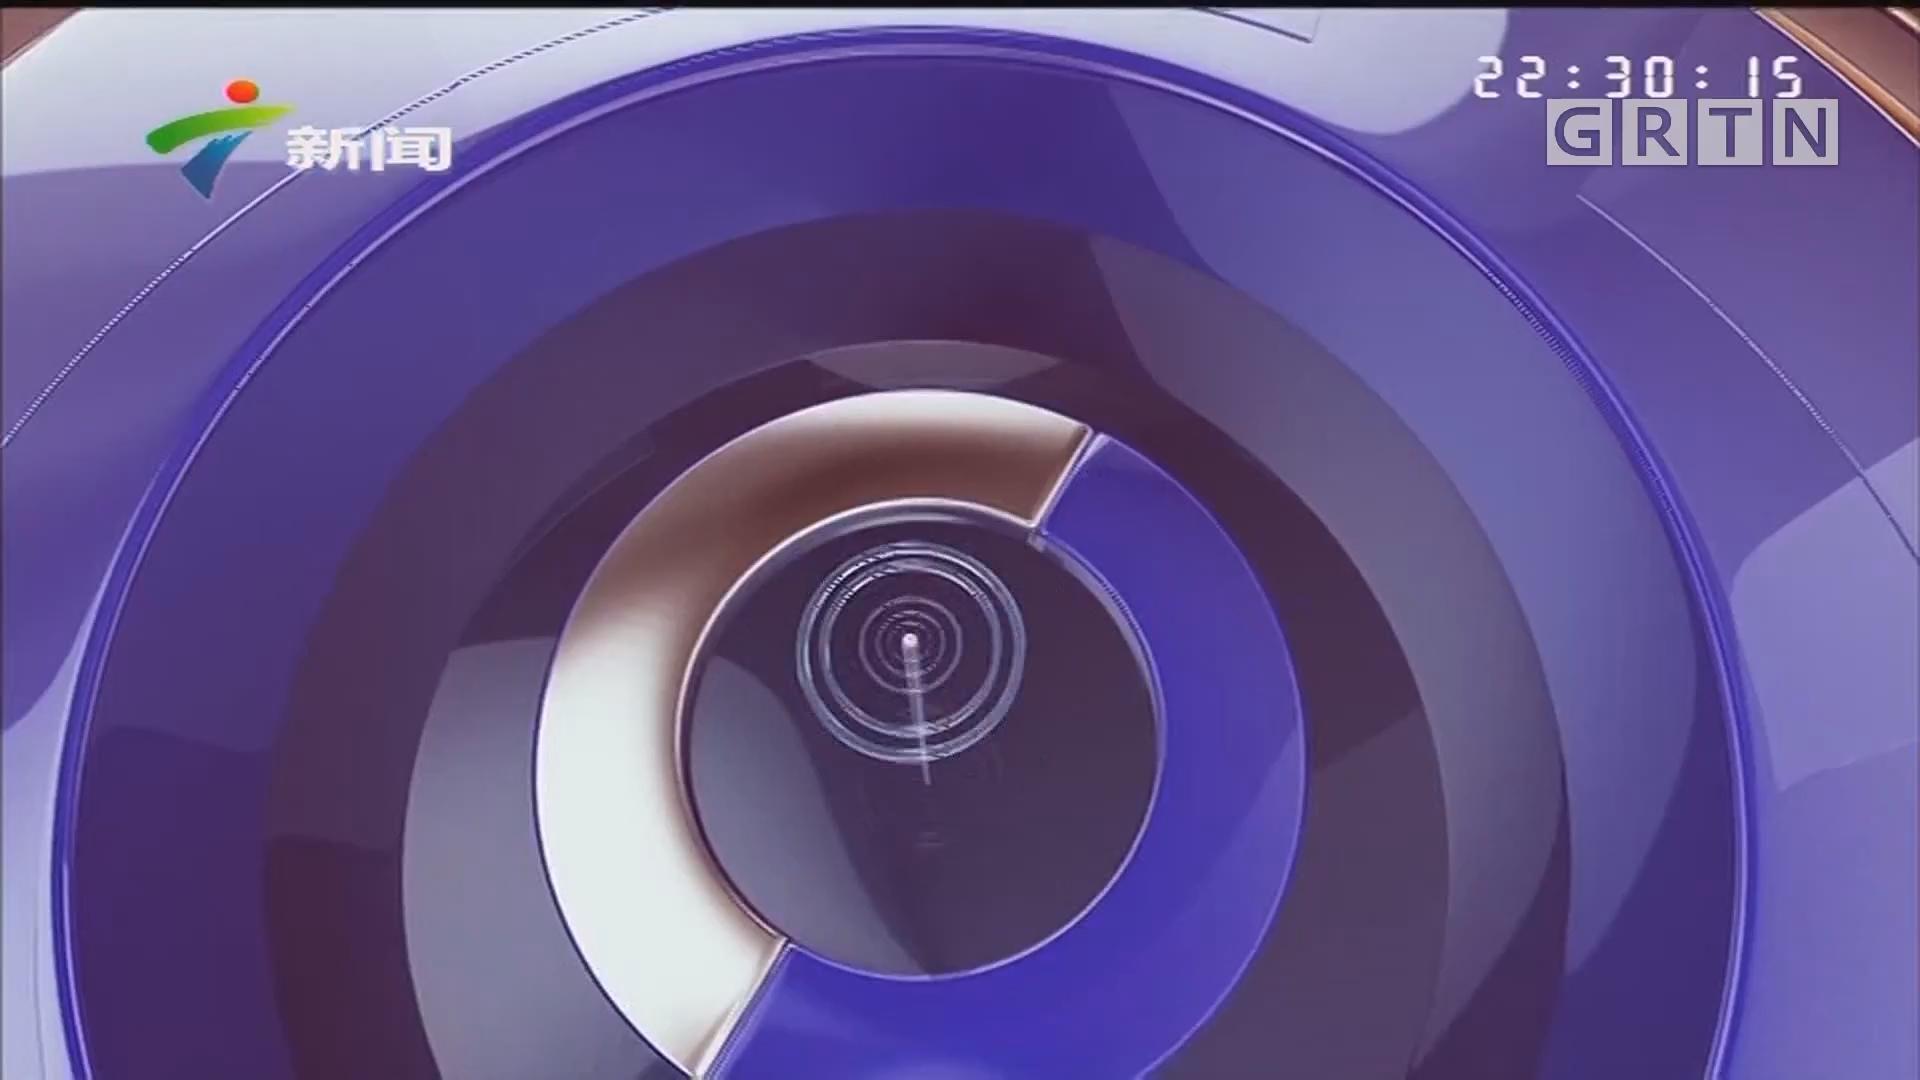 [HD][2019-12-02]新闻夜线:中方决定暂停审批美军舰机赴港修整申请 制裁美有关非政府组织